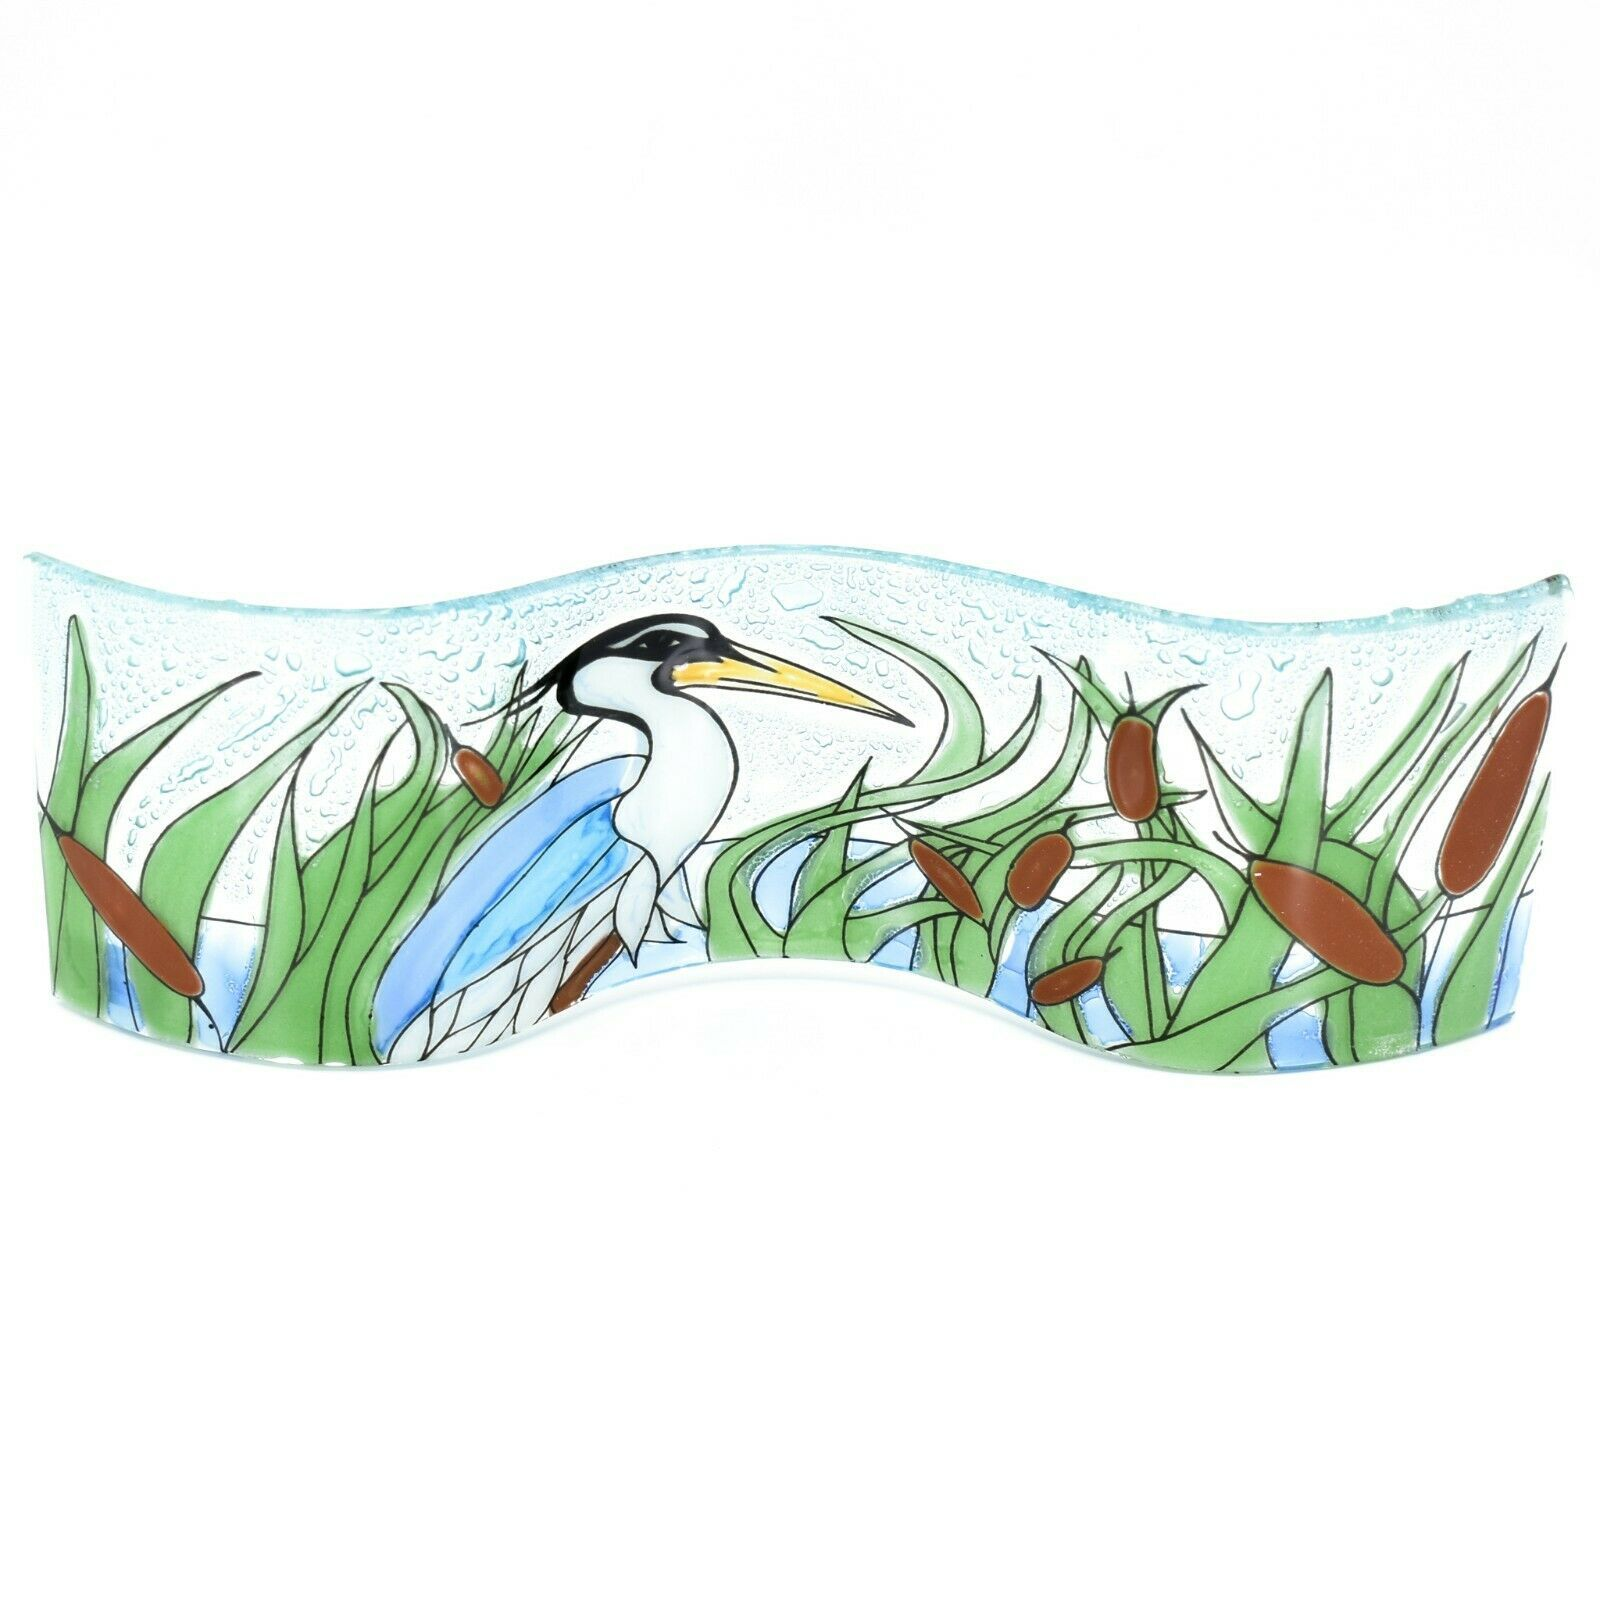 Fused Art Glass Blue Heron Cattails Wavy Decor Sun Catcher Handmade in Ecuador